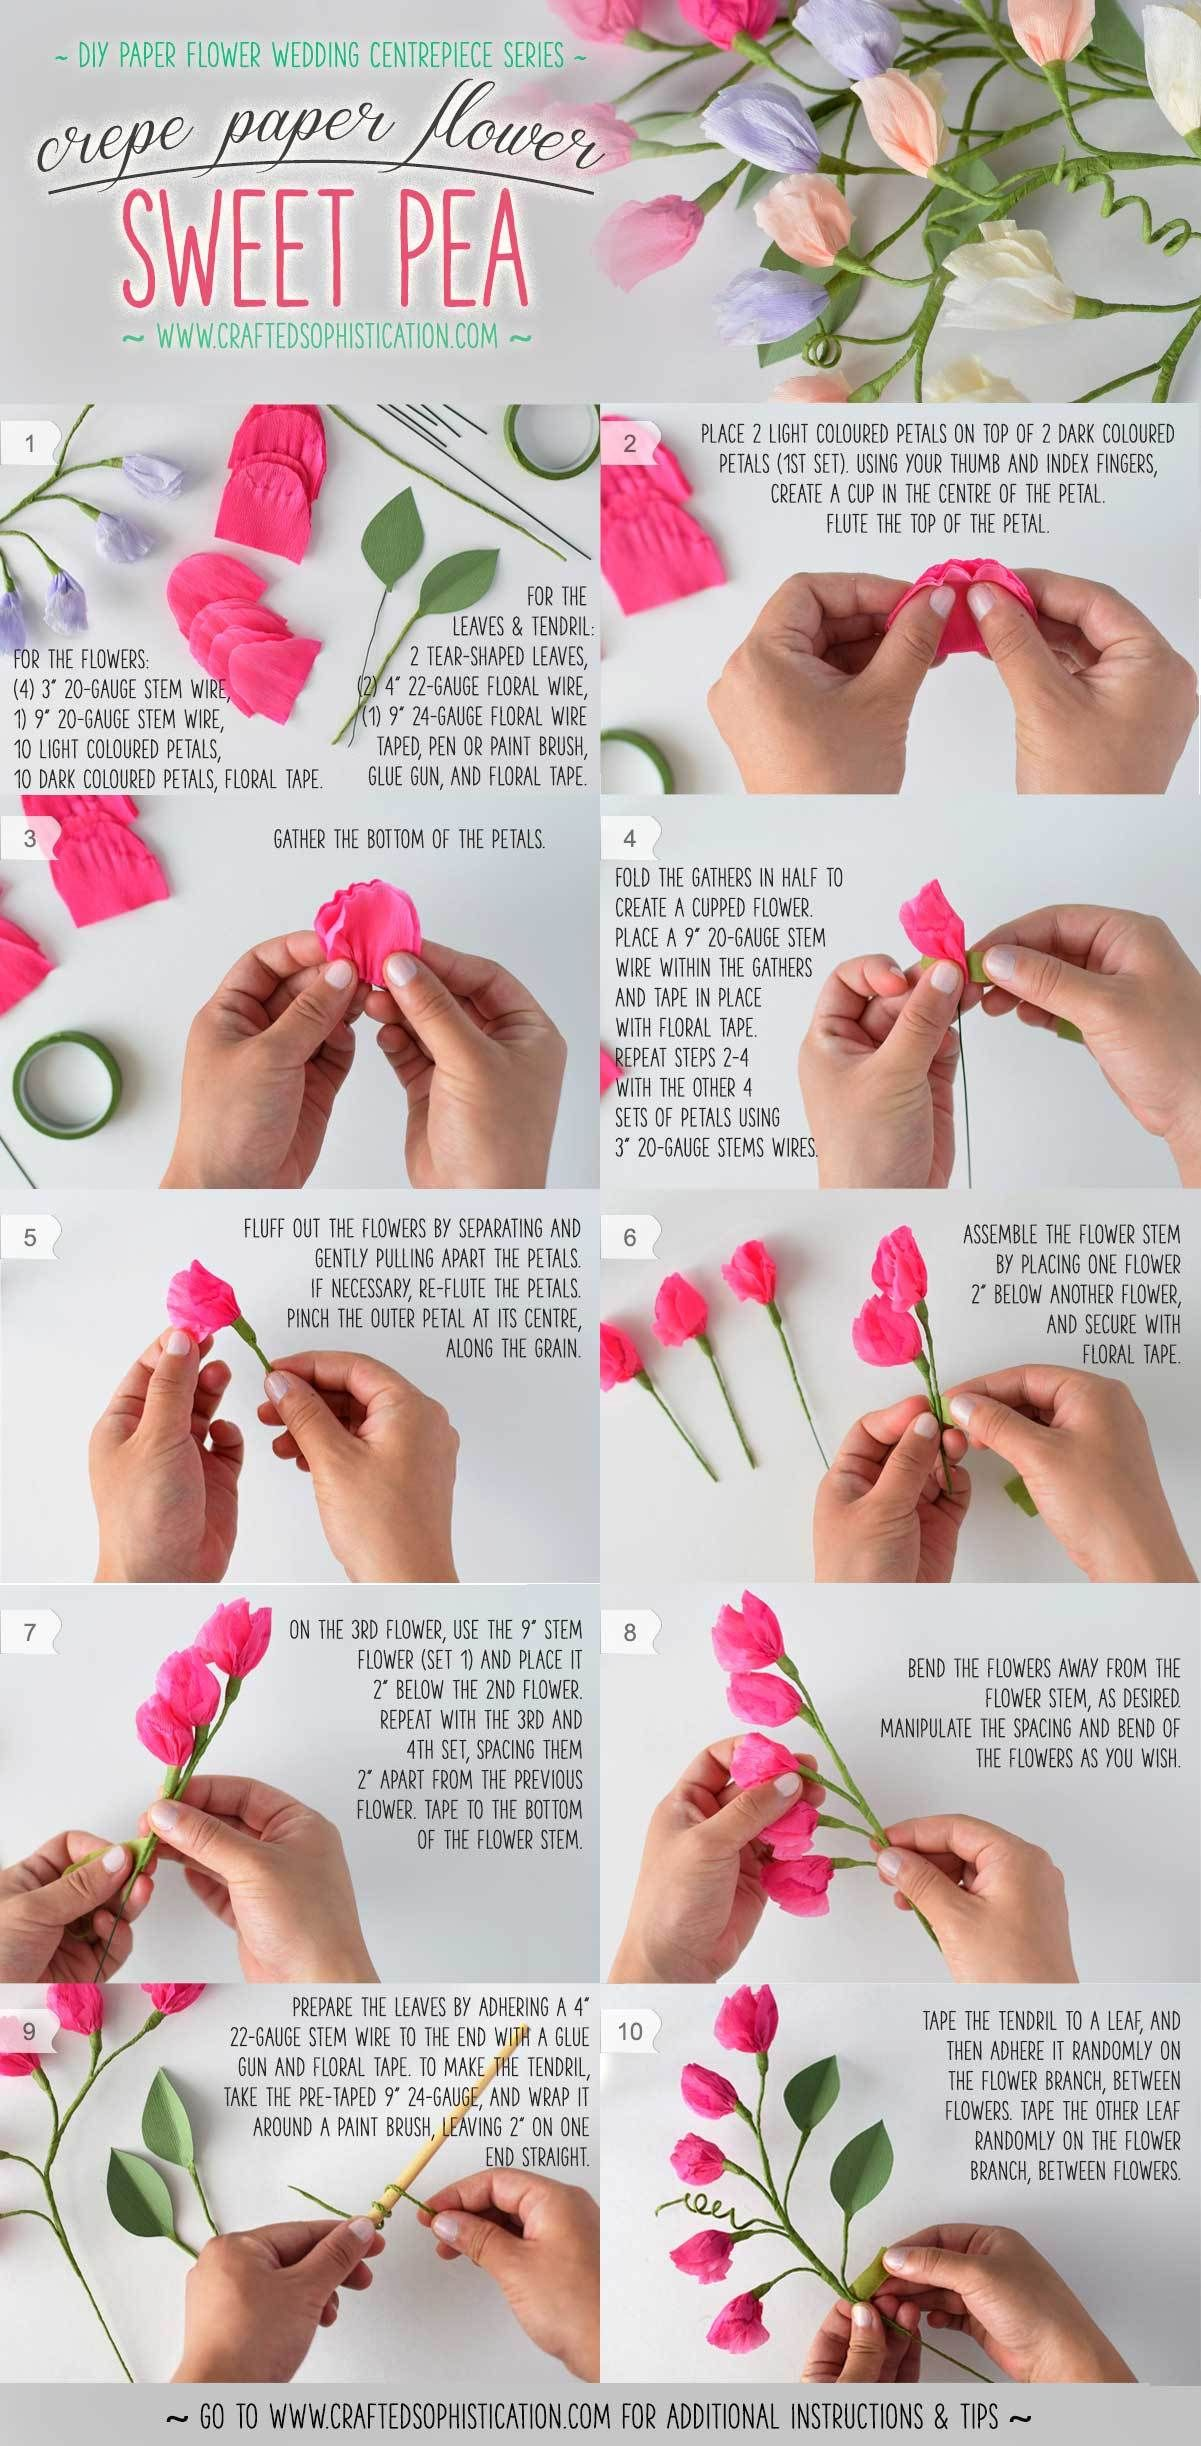 15 Of The Greatest Most Recent Flower Tutorials Online Crafty 2